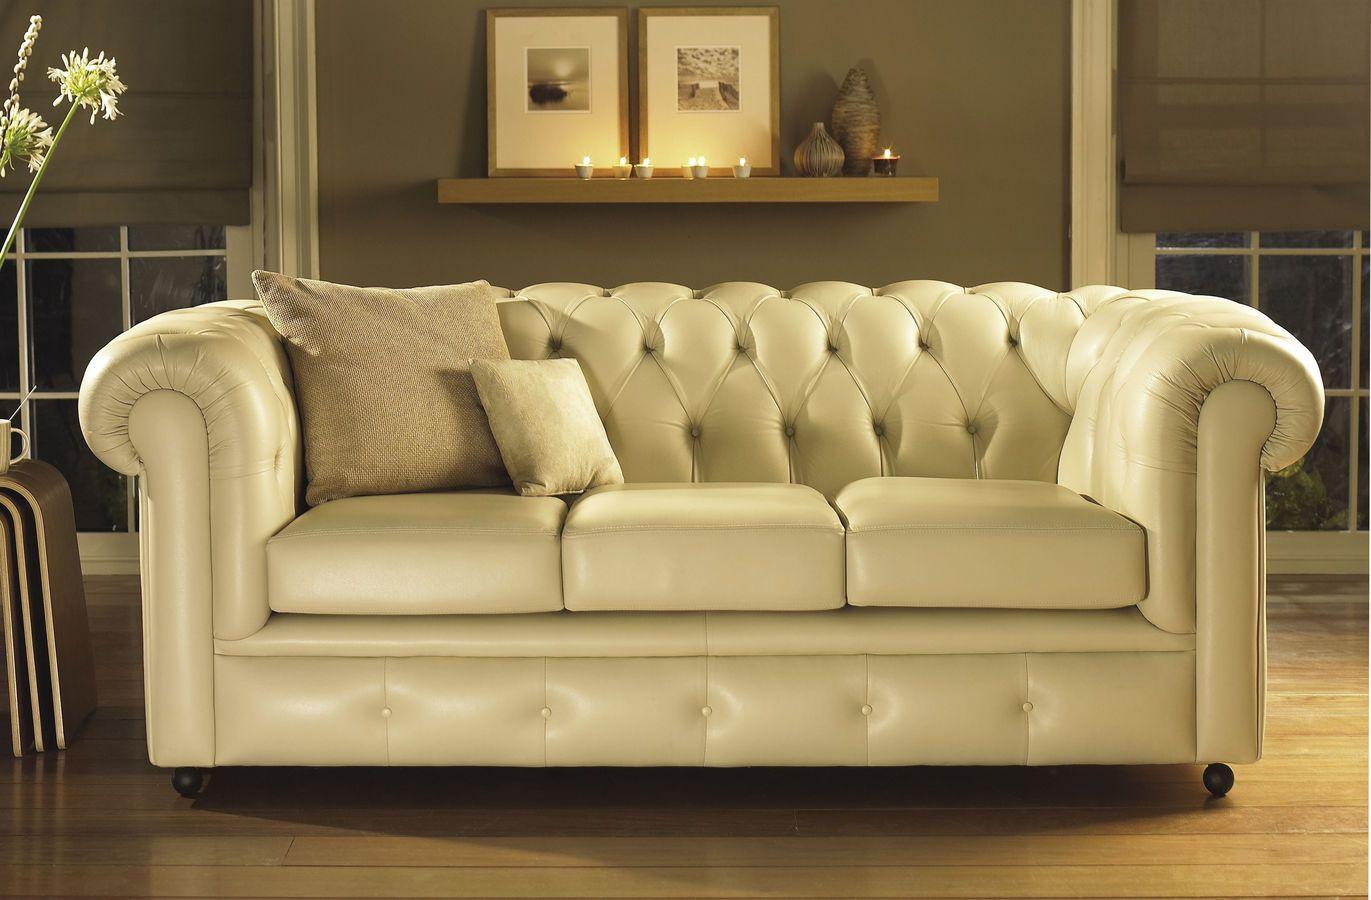 Classic Sofa Designs | Classic Sofas Ideas | Sofa Designs | Sofa ...